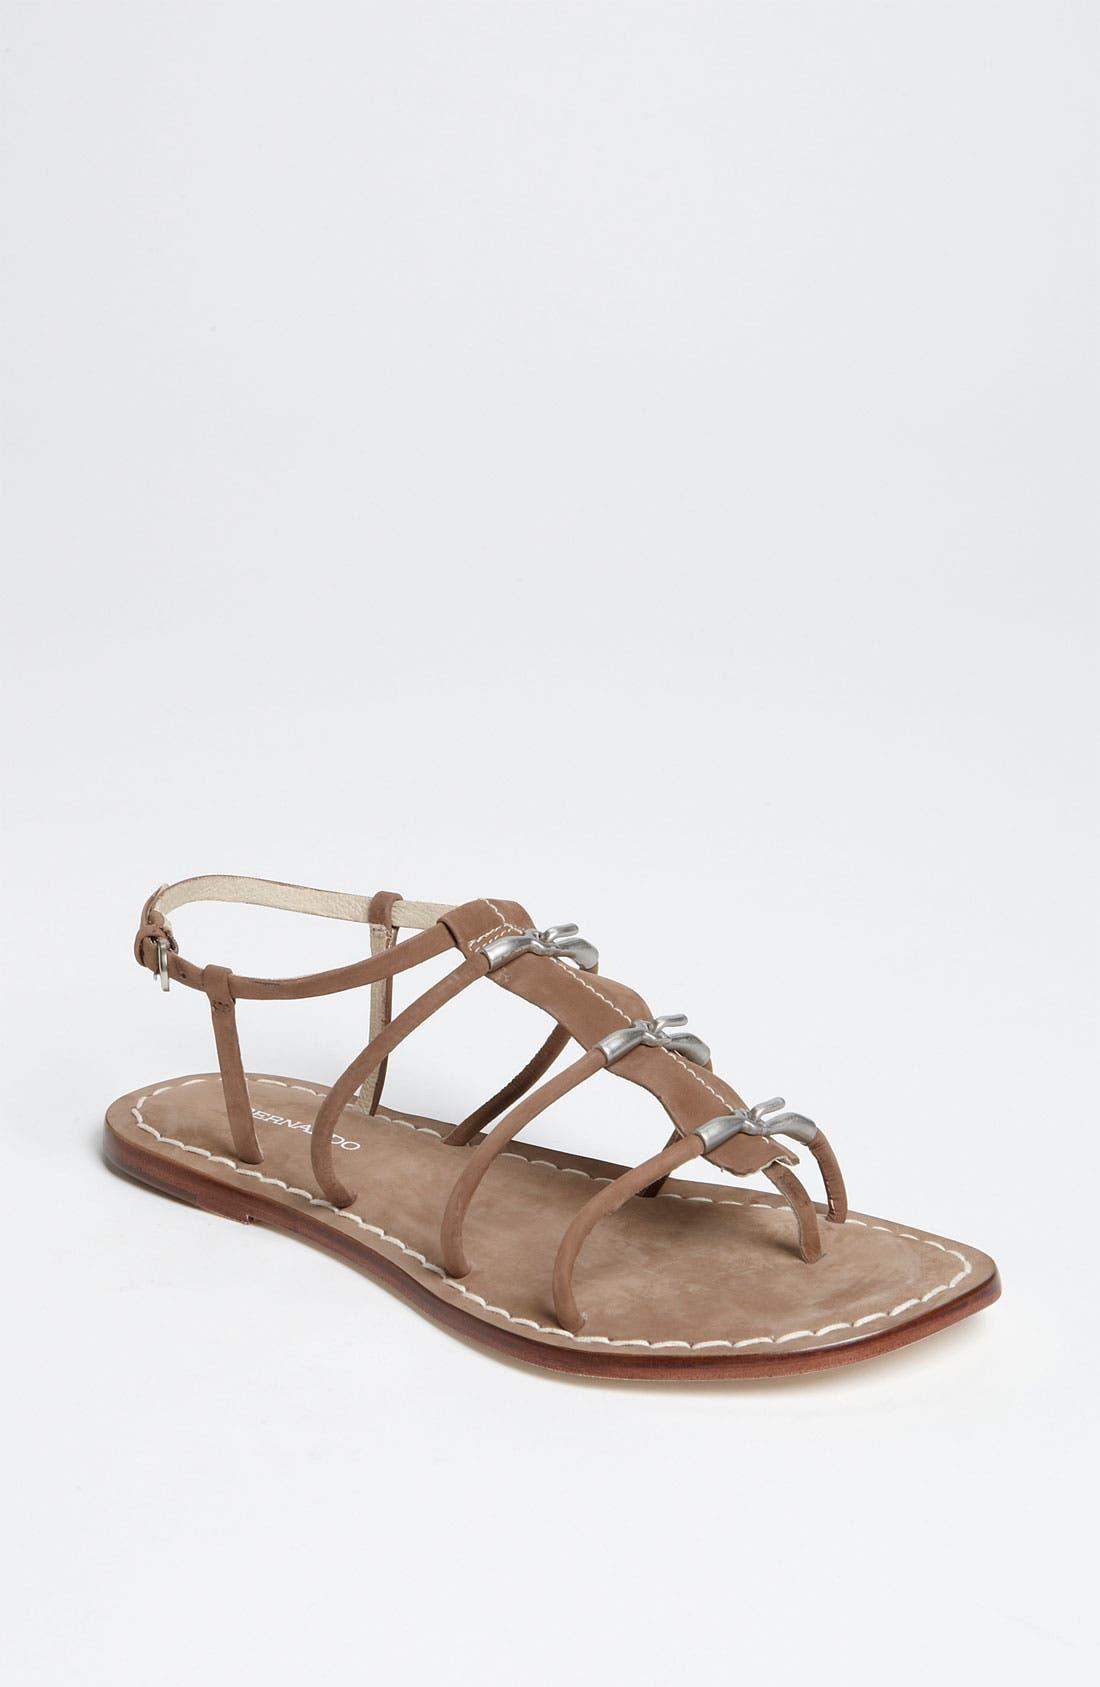 Alternate Image 1 Selected - Bernardo Footwear Maia Sandal